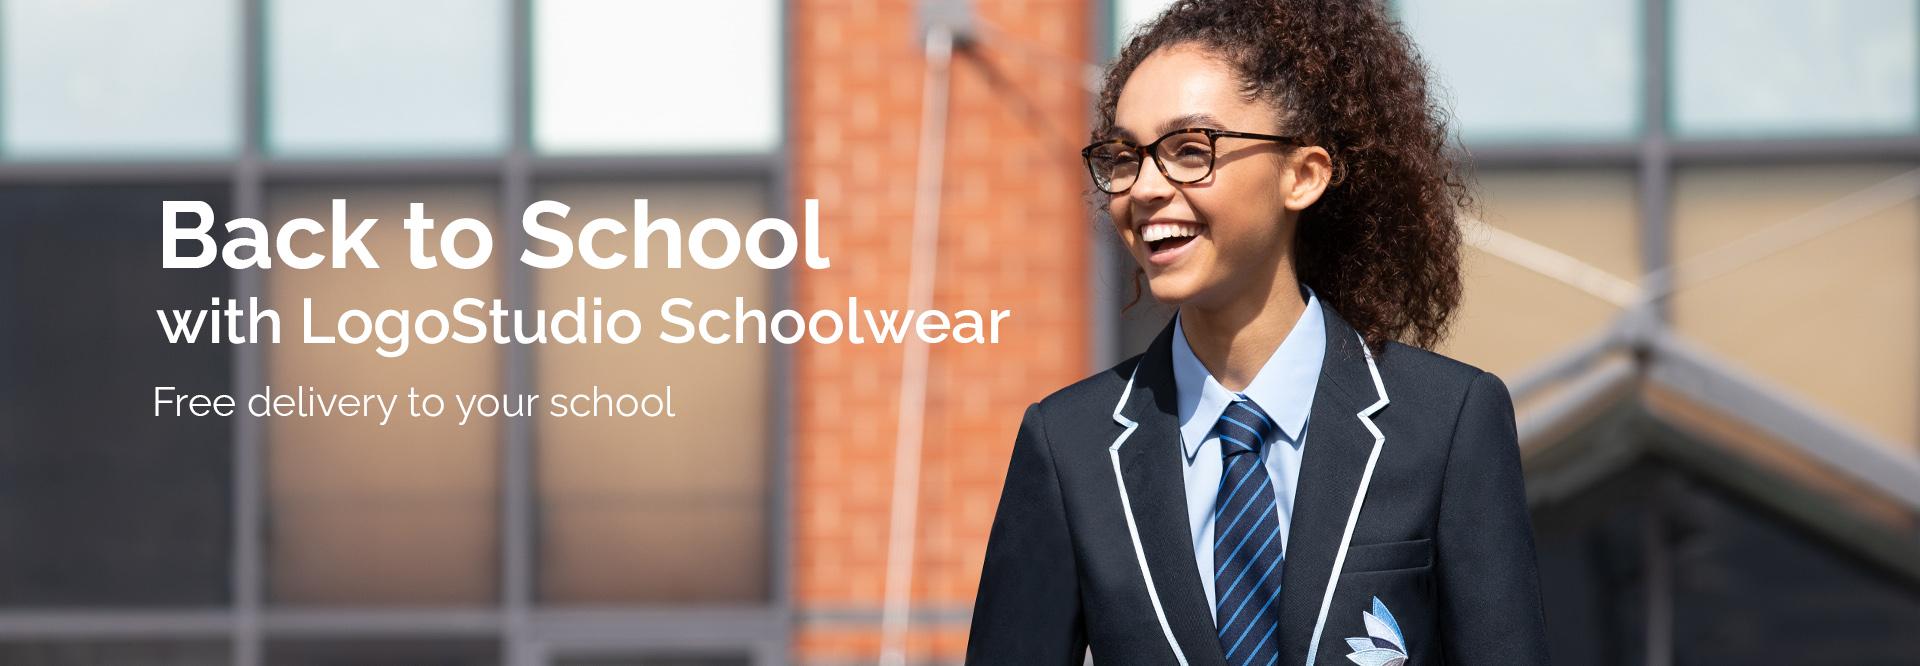 backtoschool banner